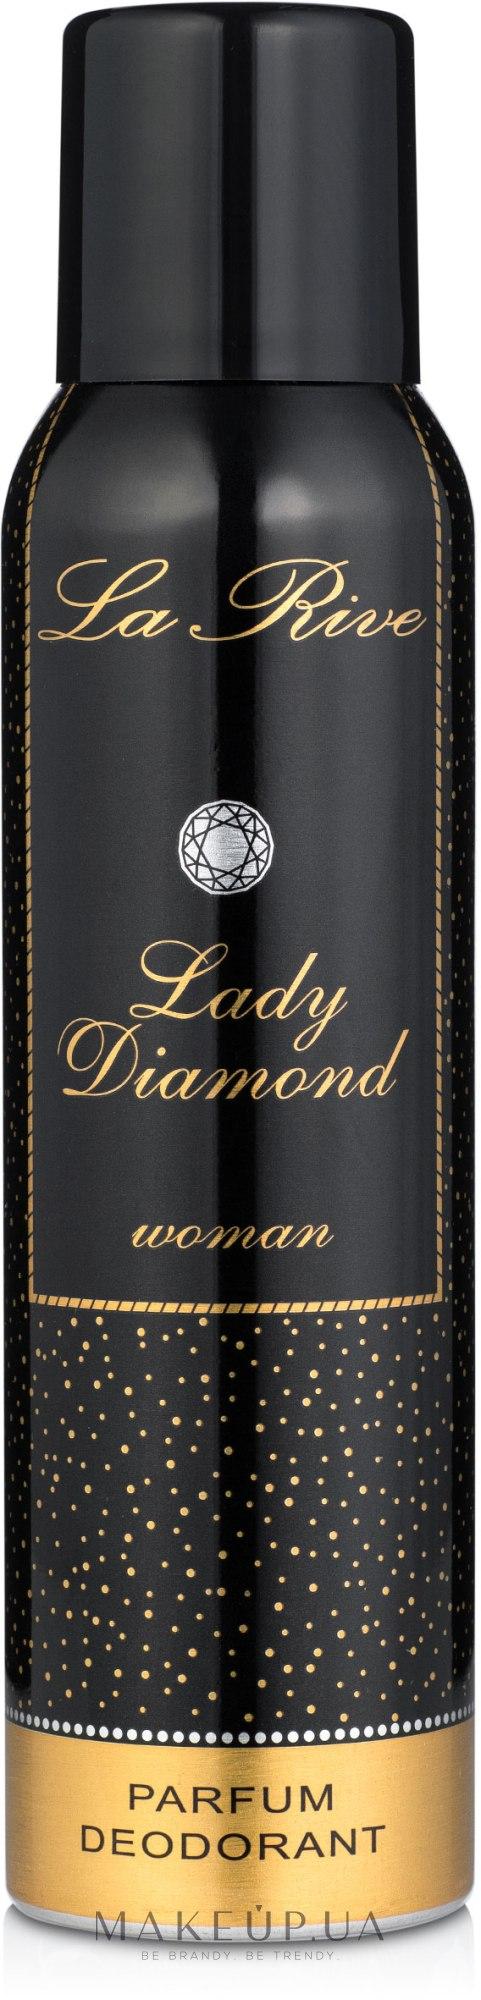 La Rive Swarovski Lady Diamond - Дезодорант — фото 150ml